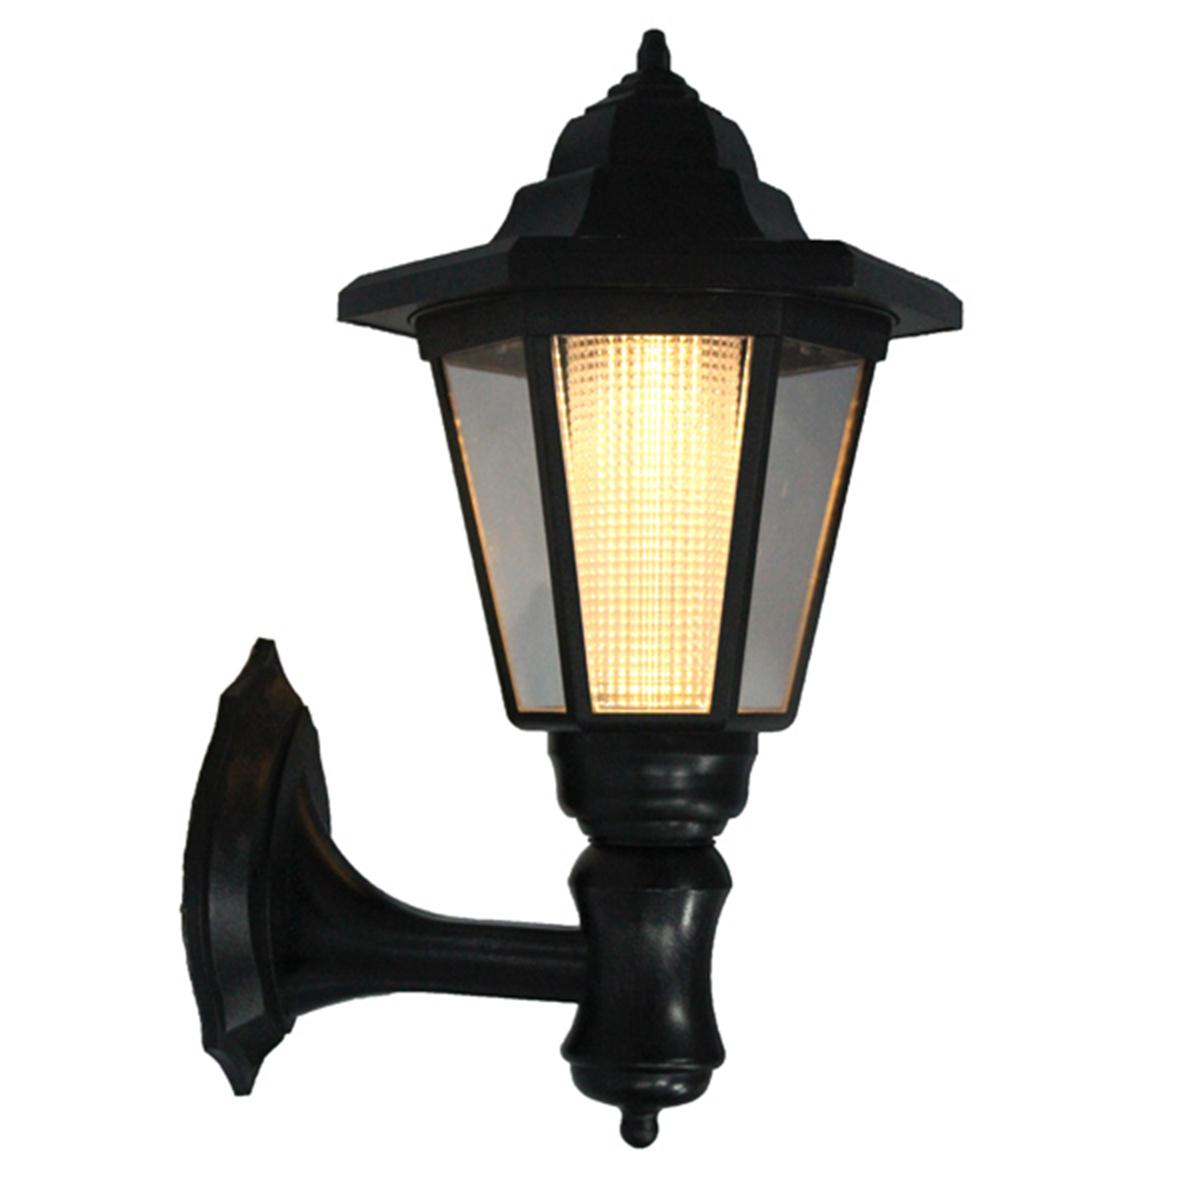 LED Solar Power Wall Lantern Lamp Sun Lights Automatic Sensor,White/ Yellow Lights, For Garden Pathway Landscape Courtyard